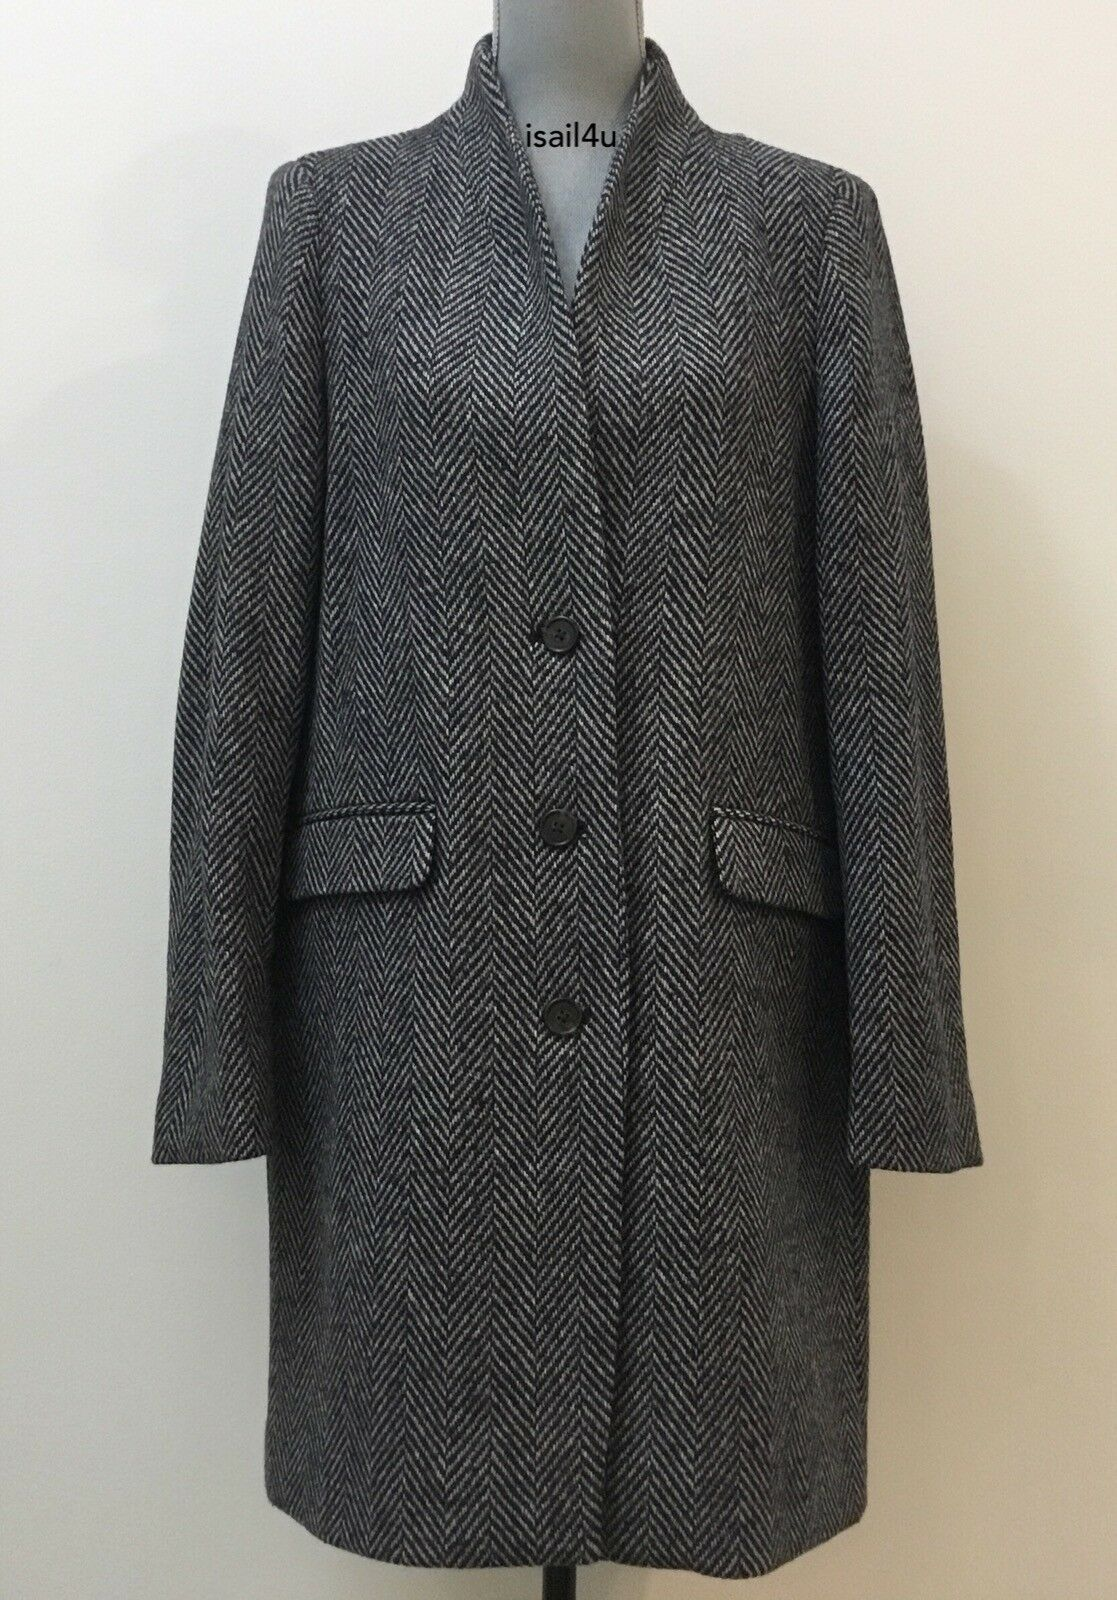 J.Crew Oversized Topcoat In English Herringbone Wool NWT Size  6 10 12 14